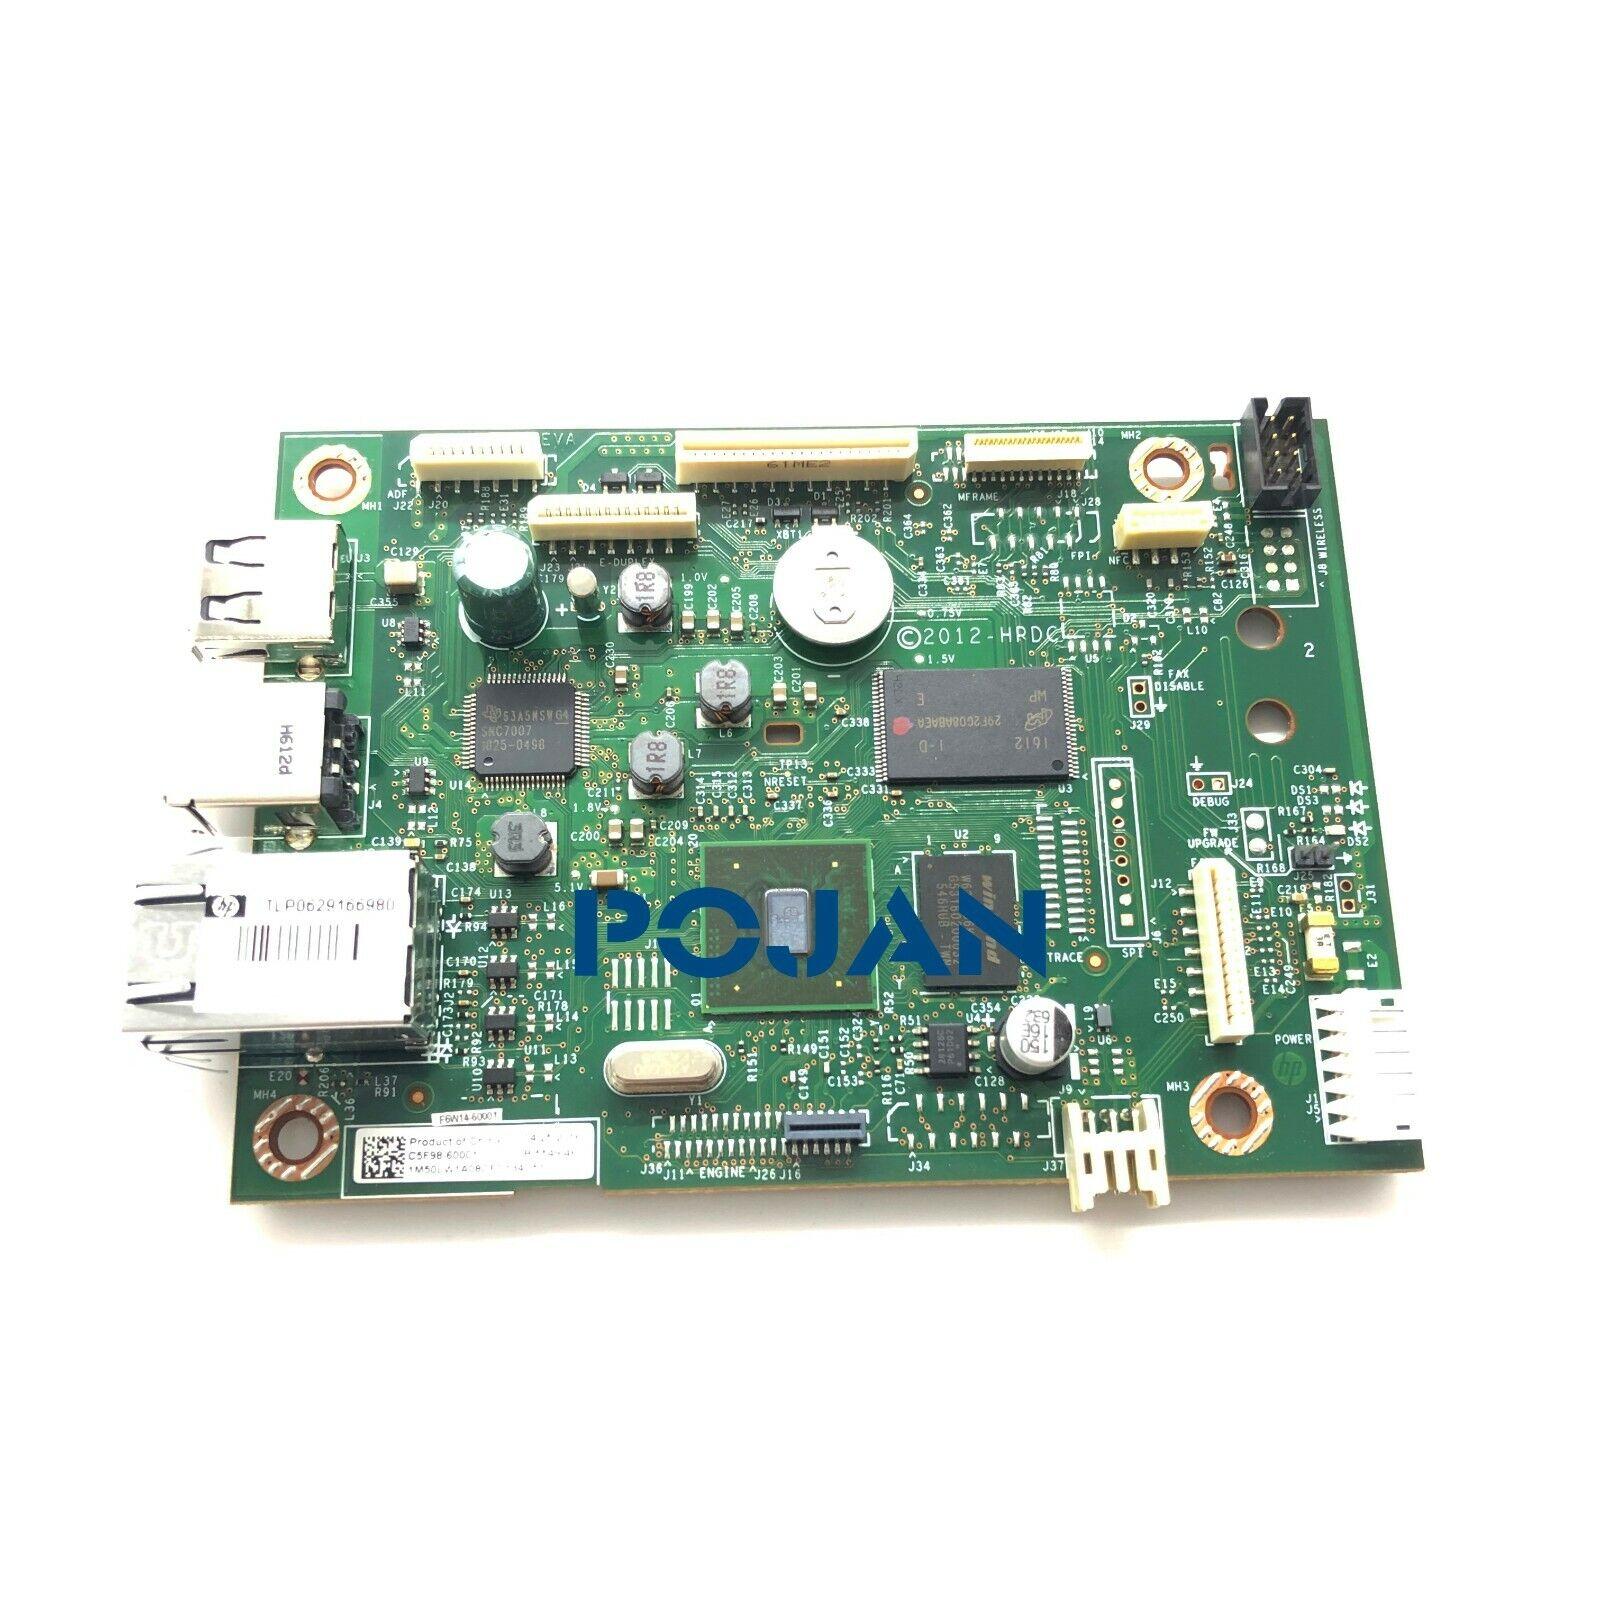 C4146-60001B HP C4146-60001B FORMATTER FOR LJ1100 22X